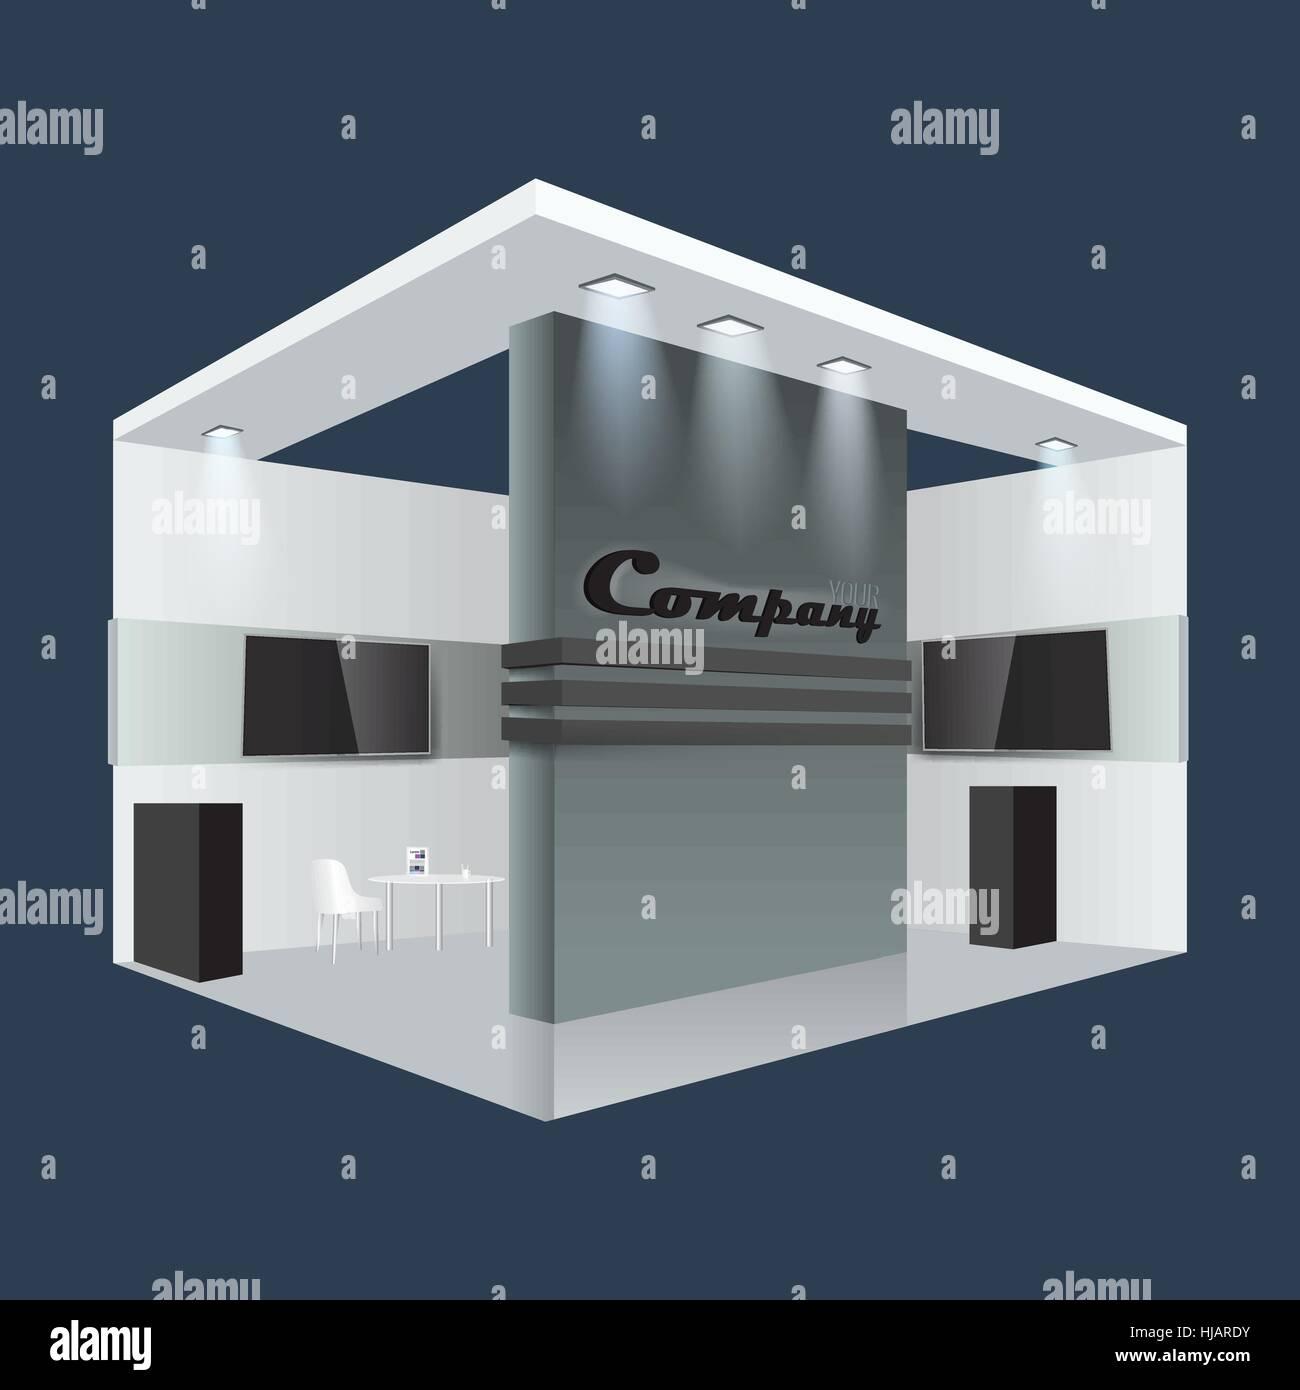 Creative Booth Exhibition : Illustrated unique creative exhibition stand display design info